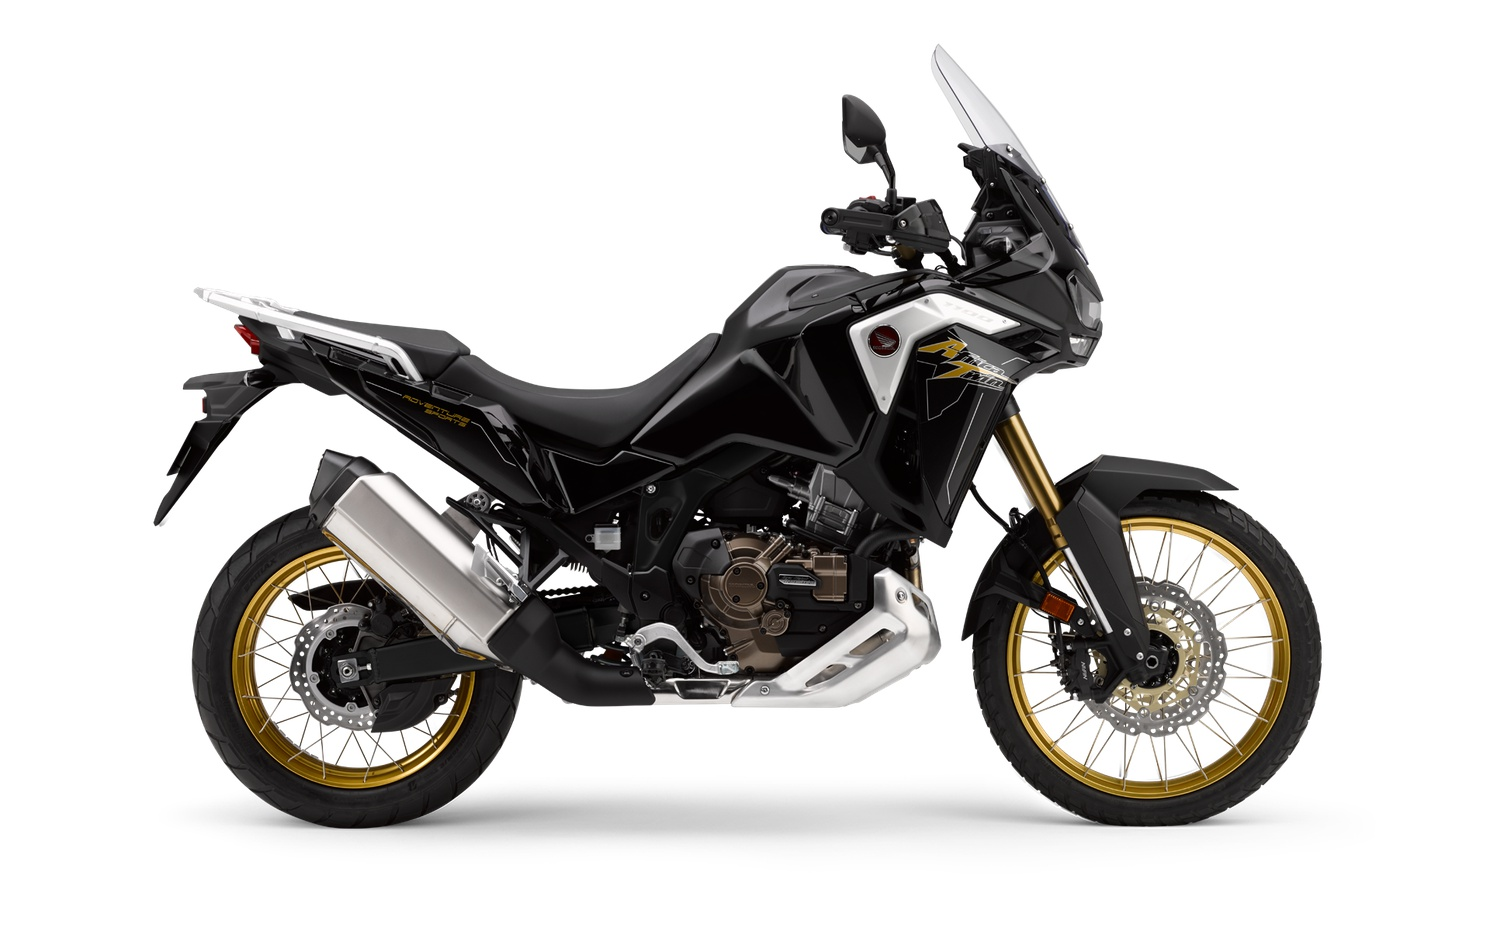 Honda Africa Twin Adventure Sports  Noir Obscur Métallique 2020